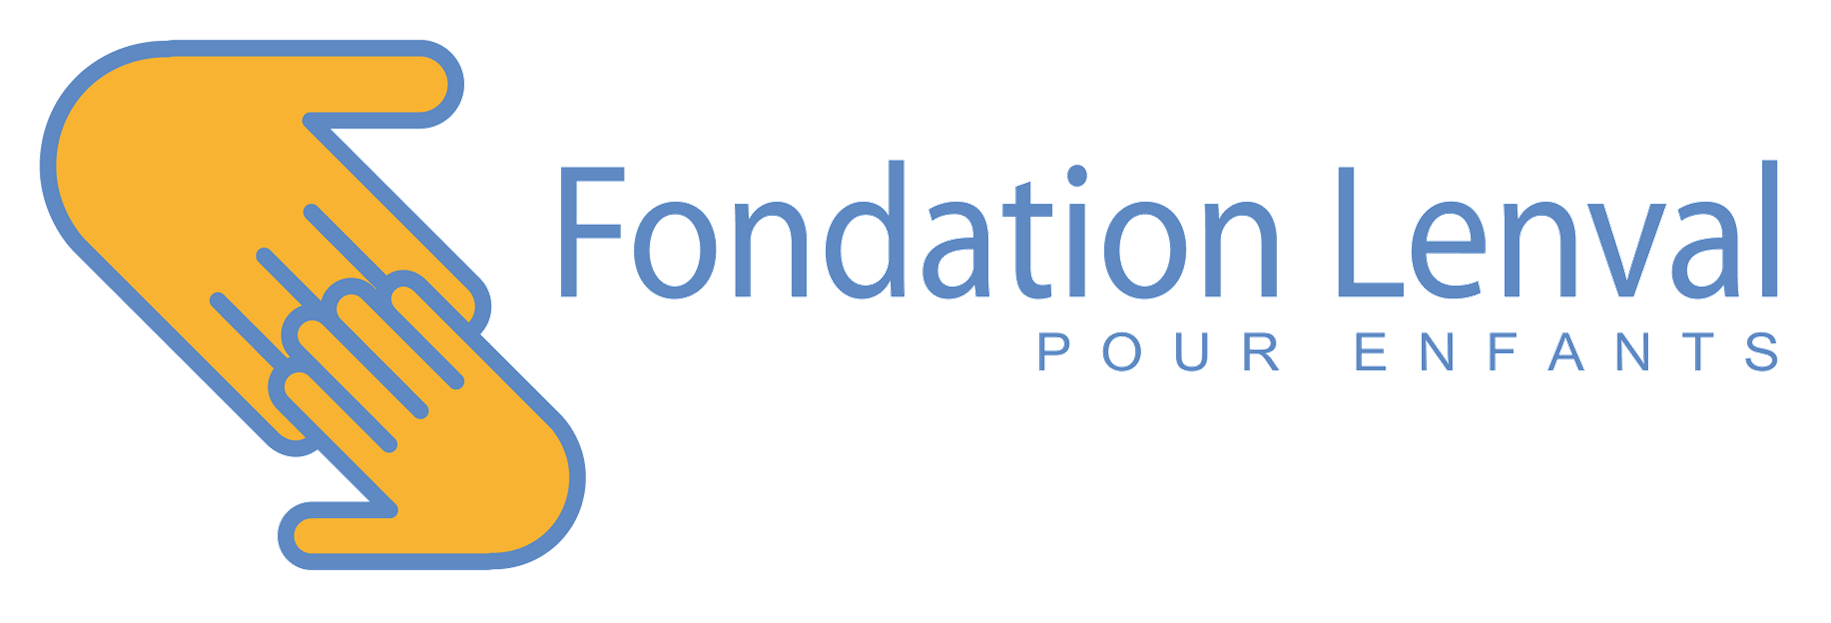 logo client cegi fondation lenval